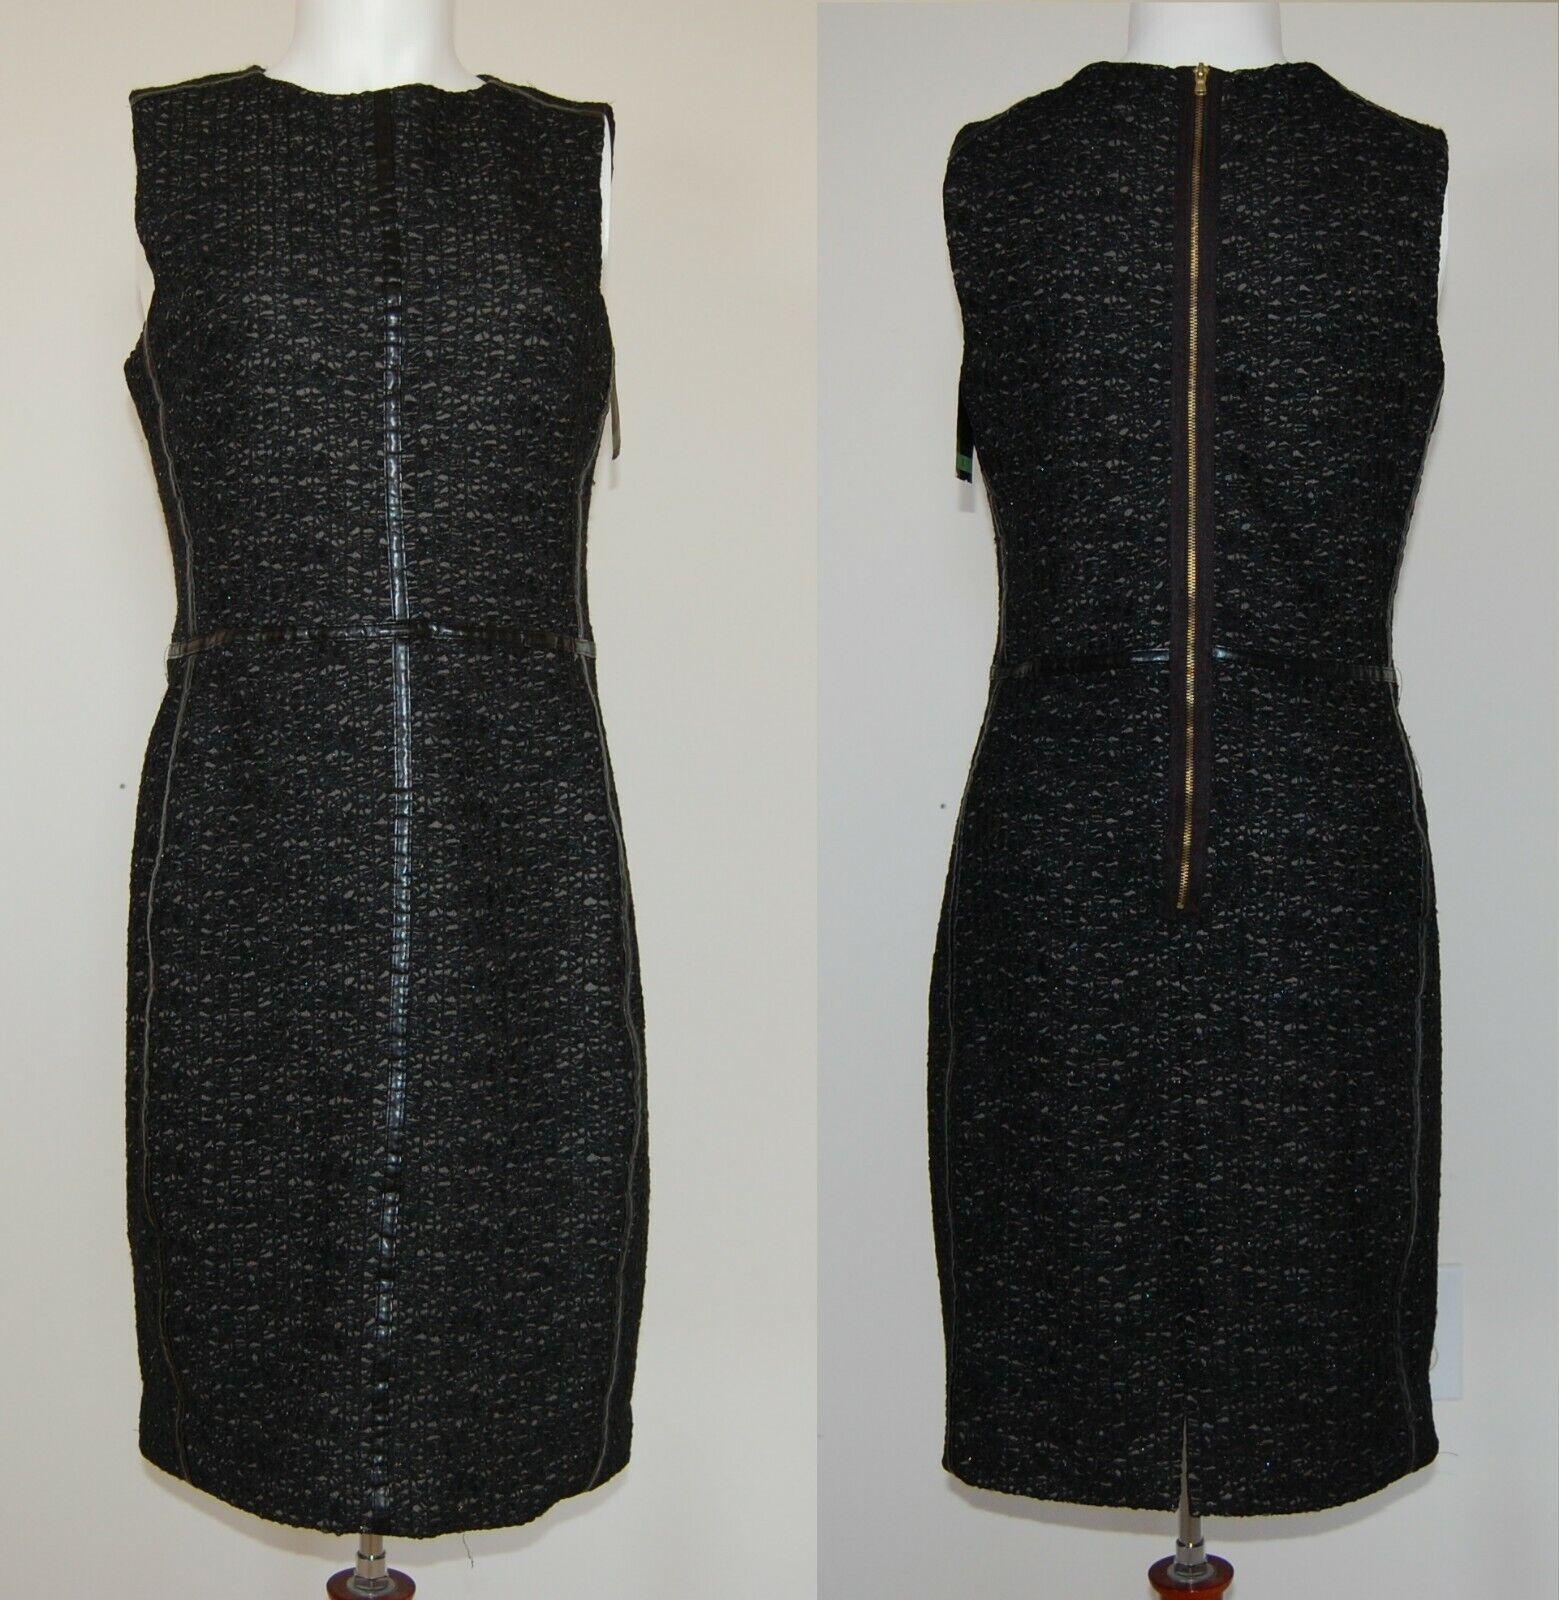 Just Taylor Woherren schwarz Metallic Faux Leather Trim Sheath Dress Größe 8 NWT